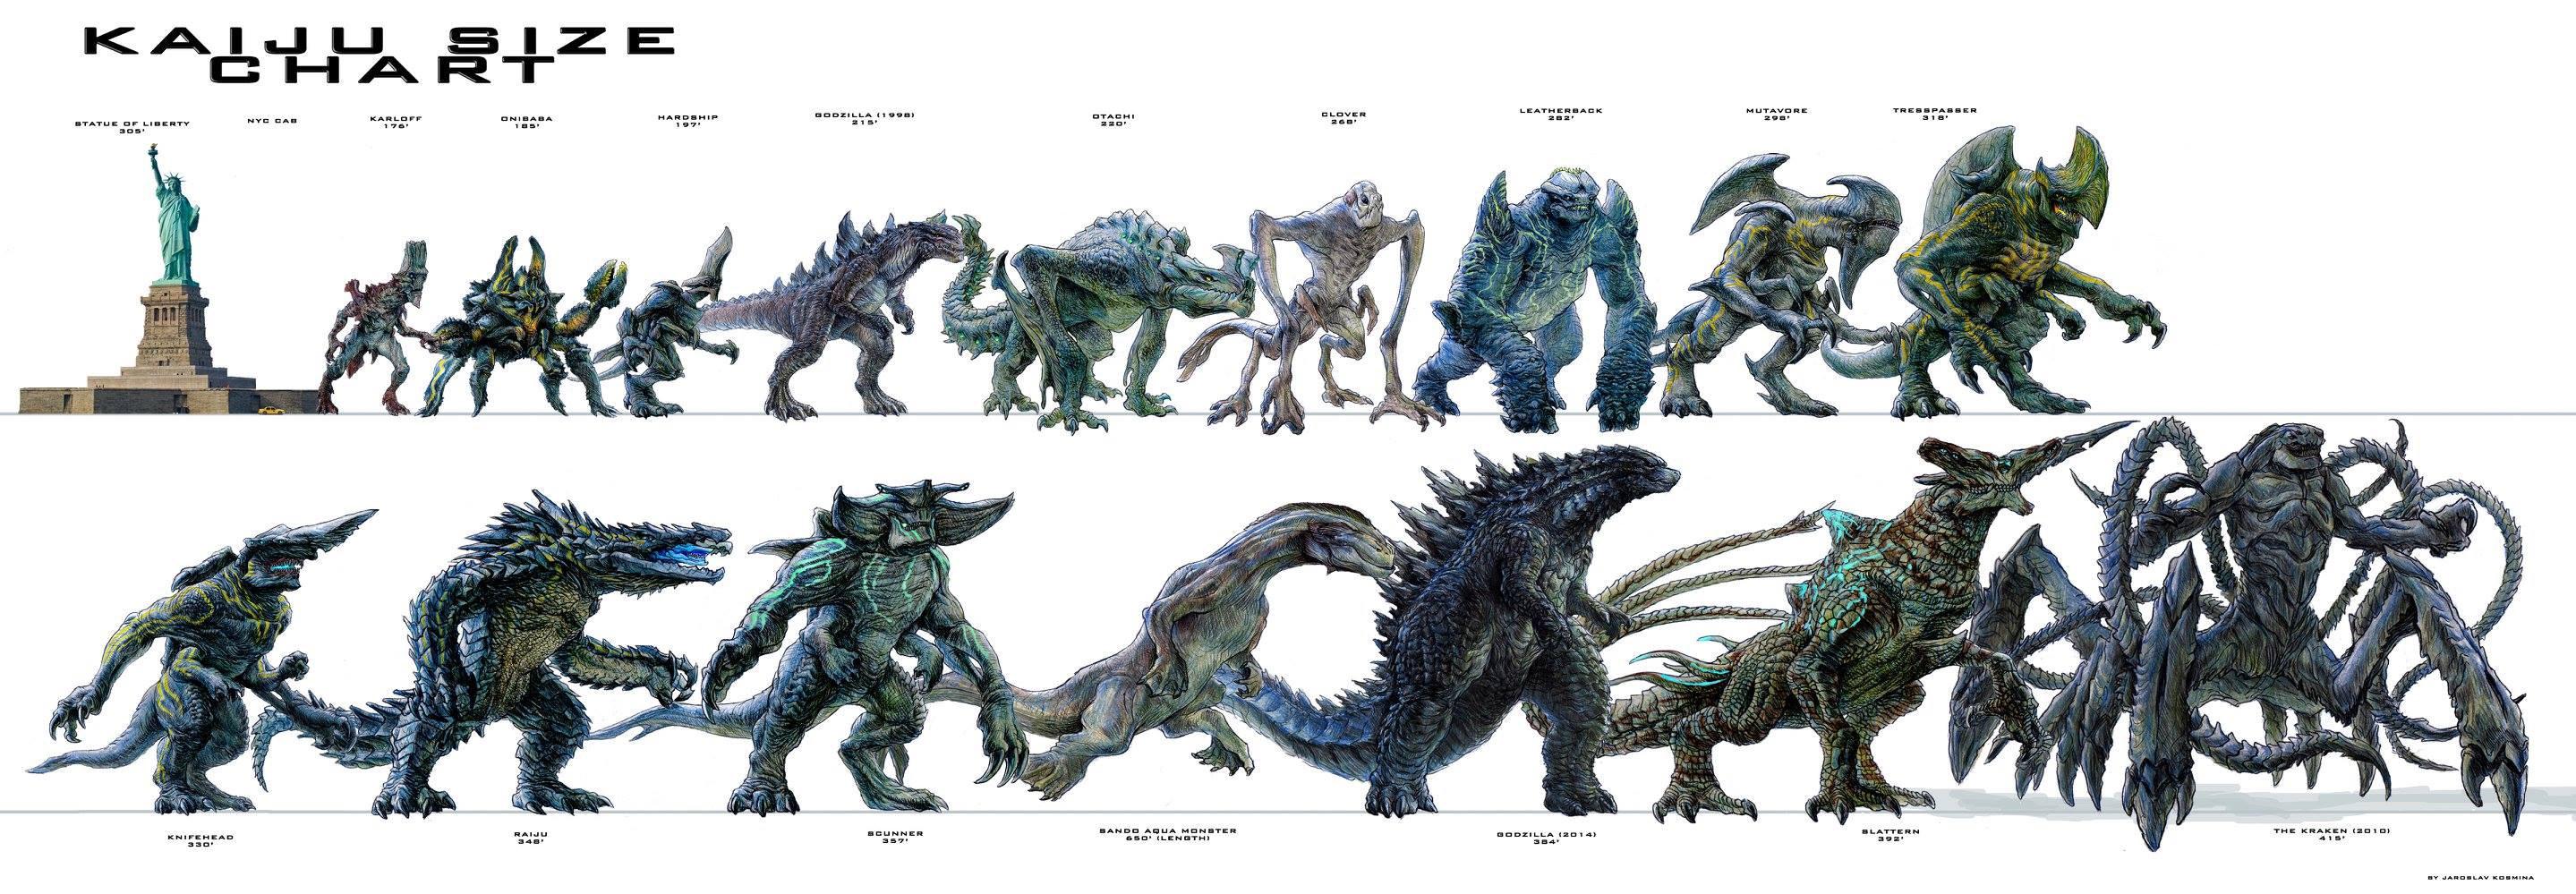 kaiju_size_comparison_chart_full